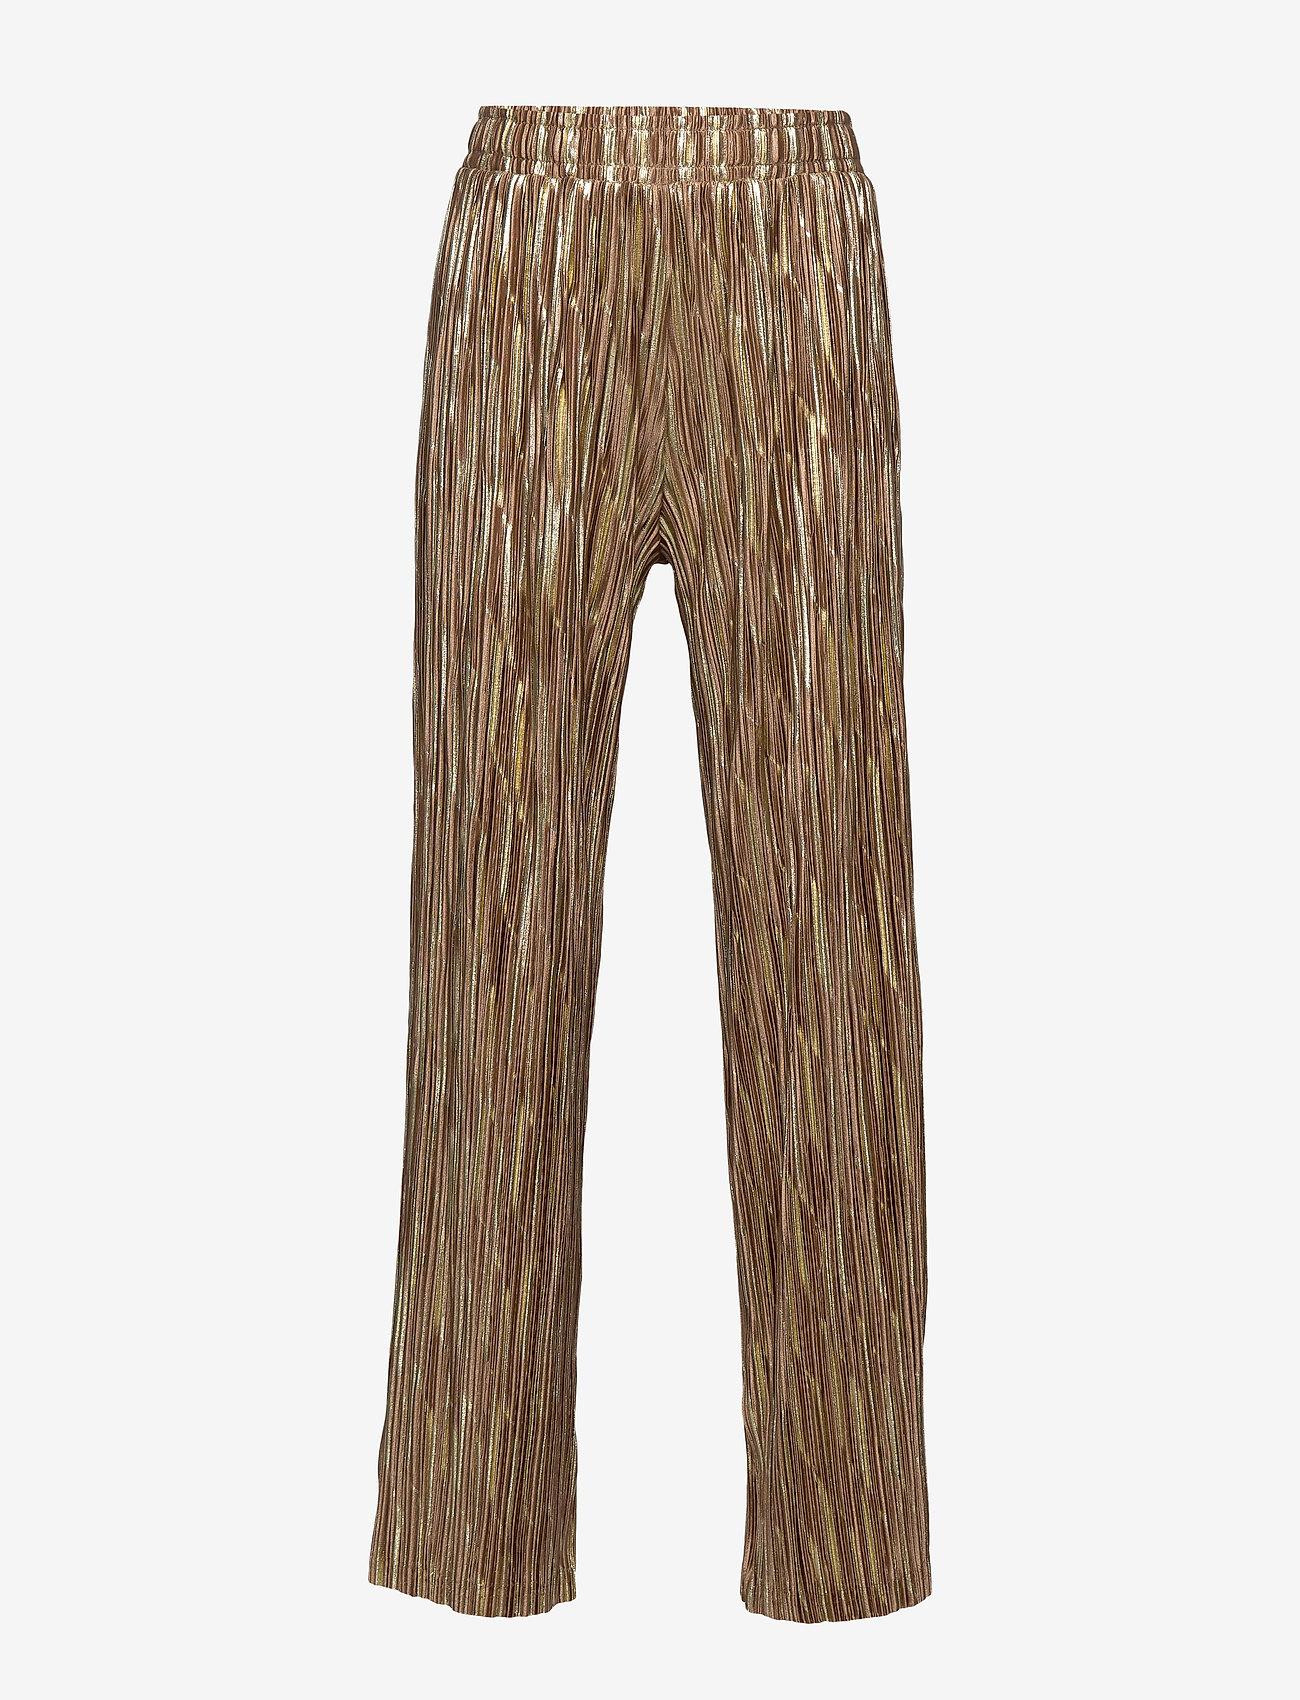 Petit by Sofie Schnoor - Pants - pantalons - camel - 0